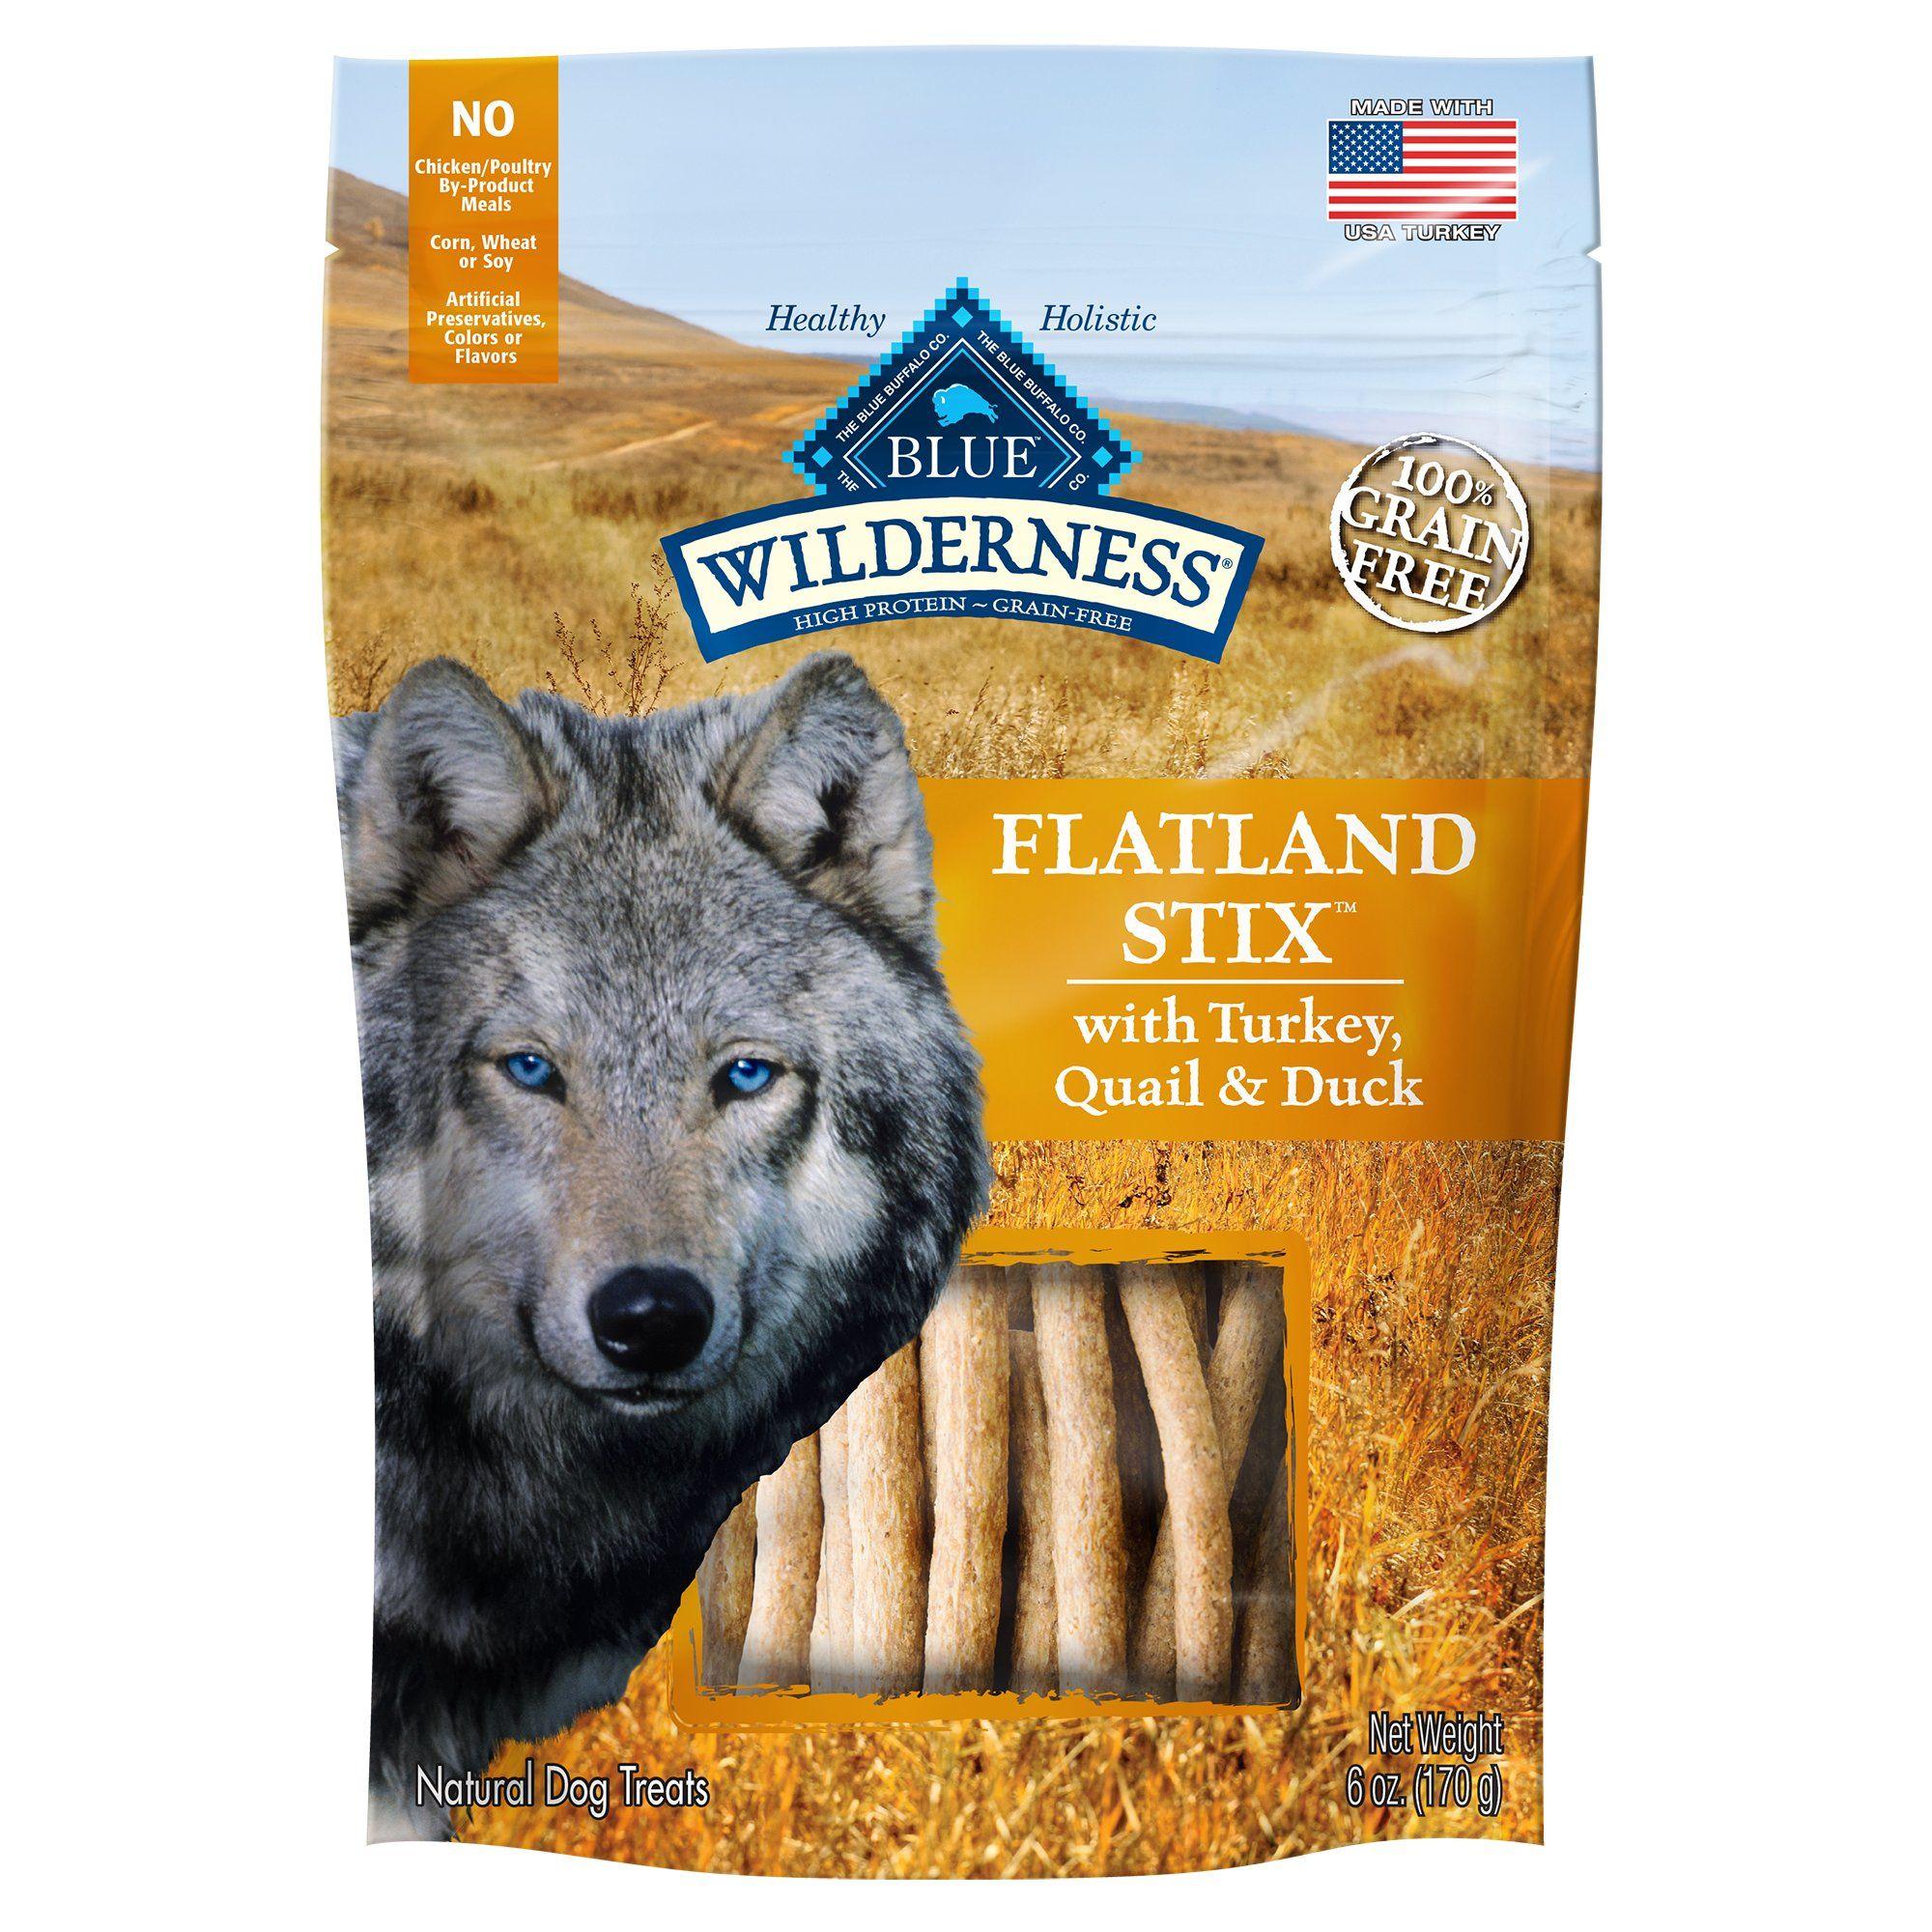 Blue Buffalo Blue Wilderness Flatland Feast Stix Dog Treats 6 Oz